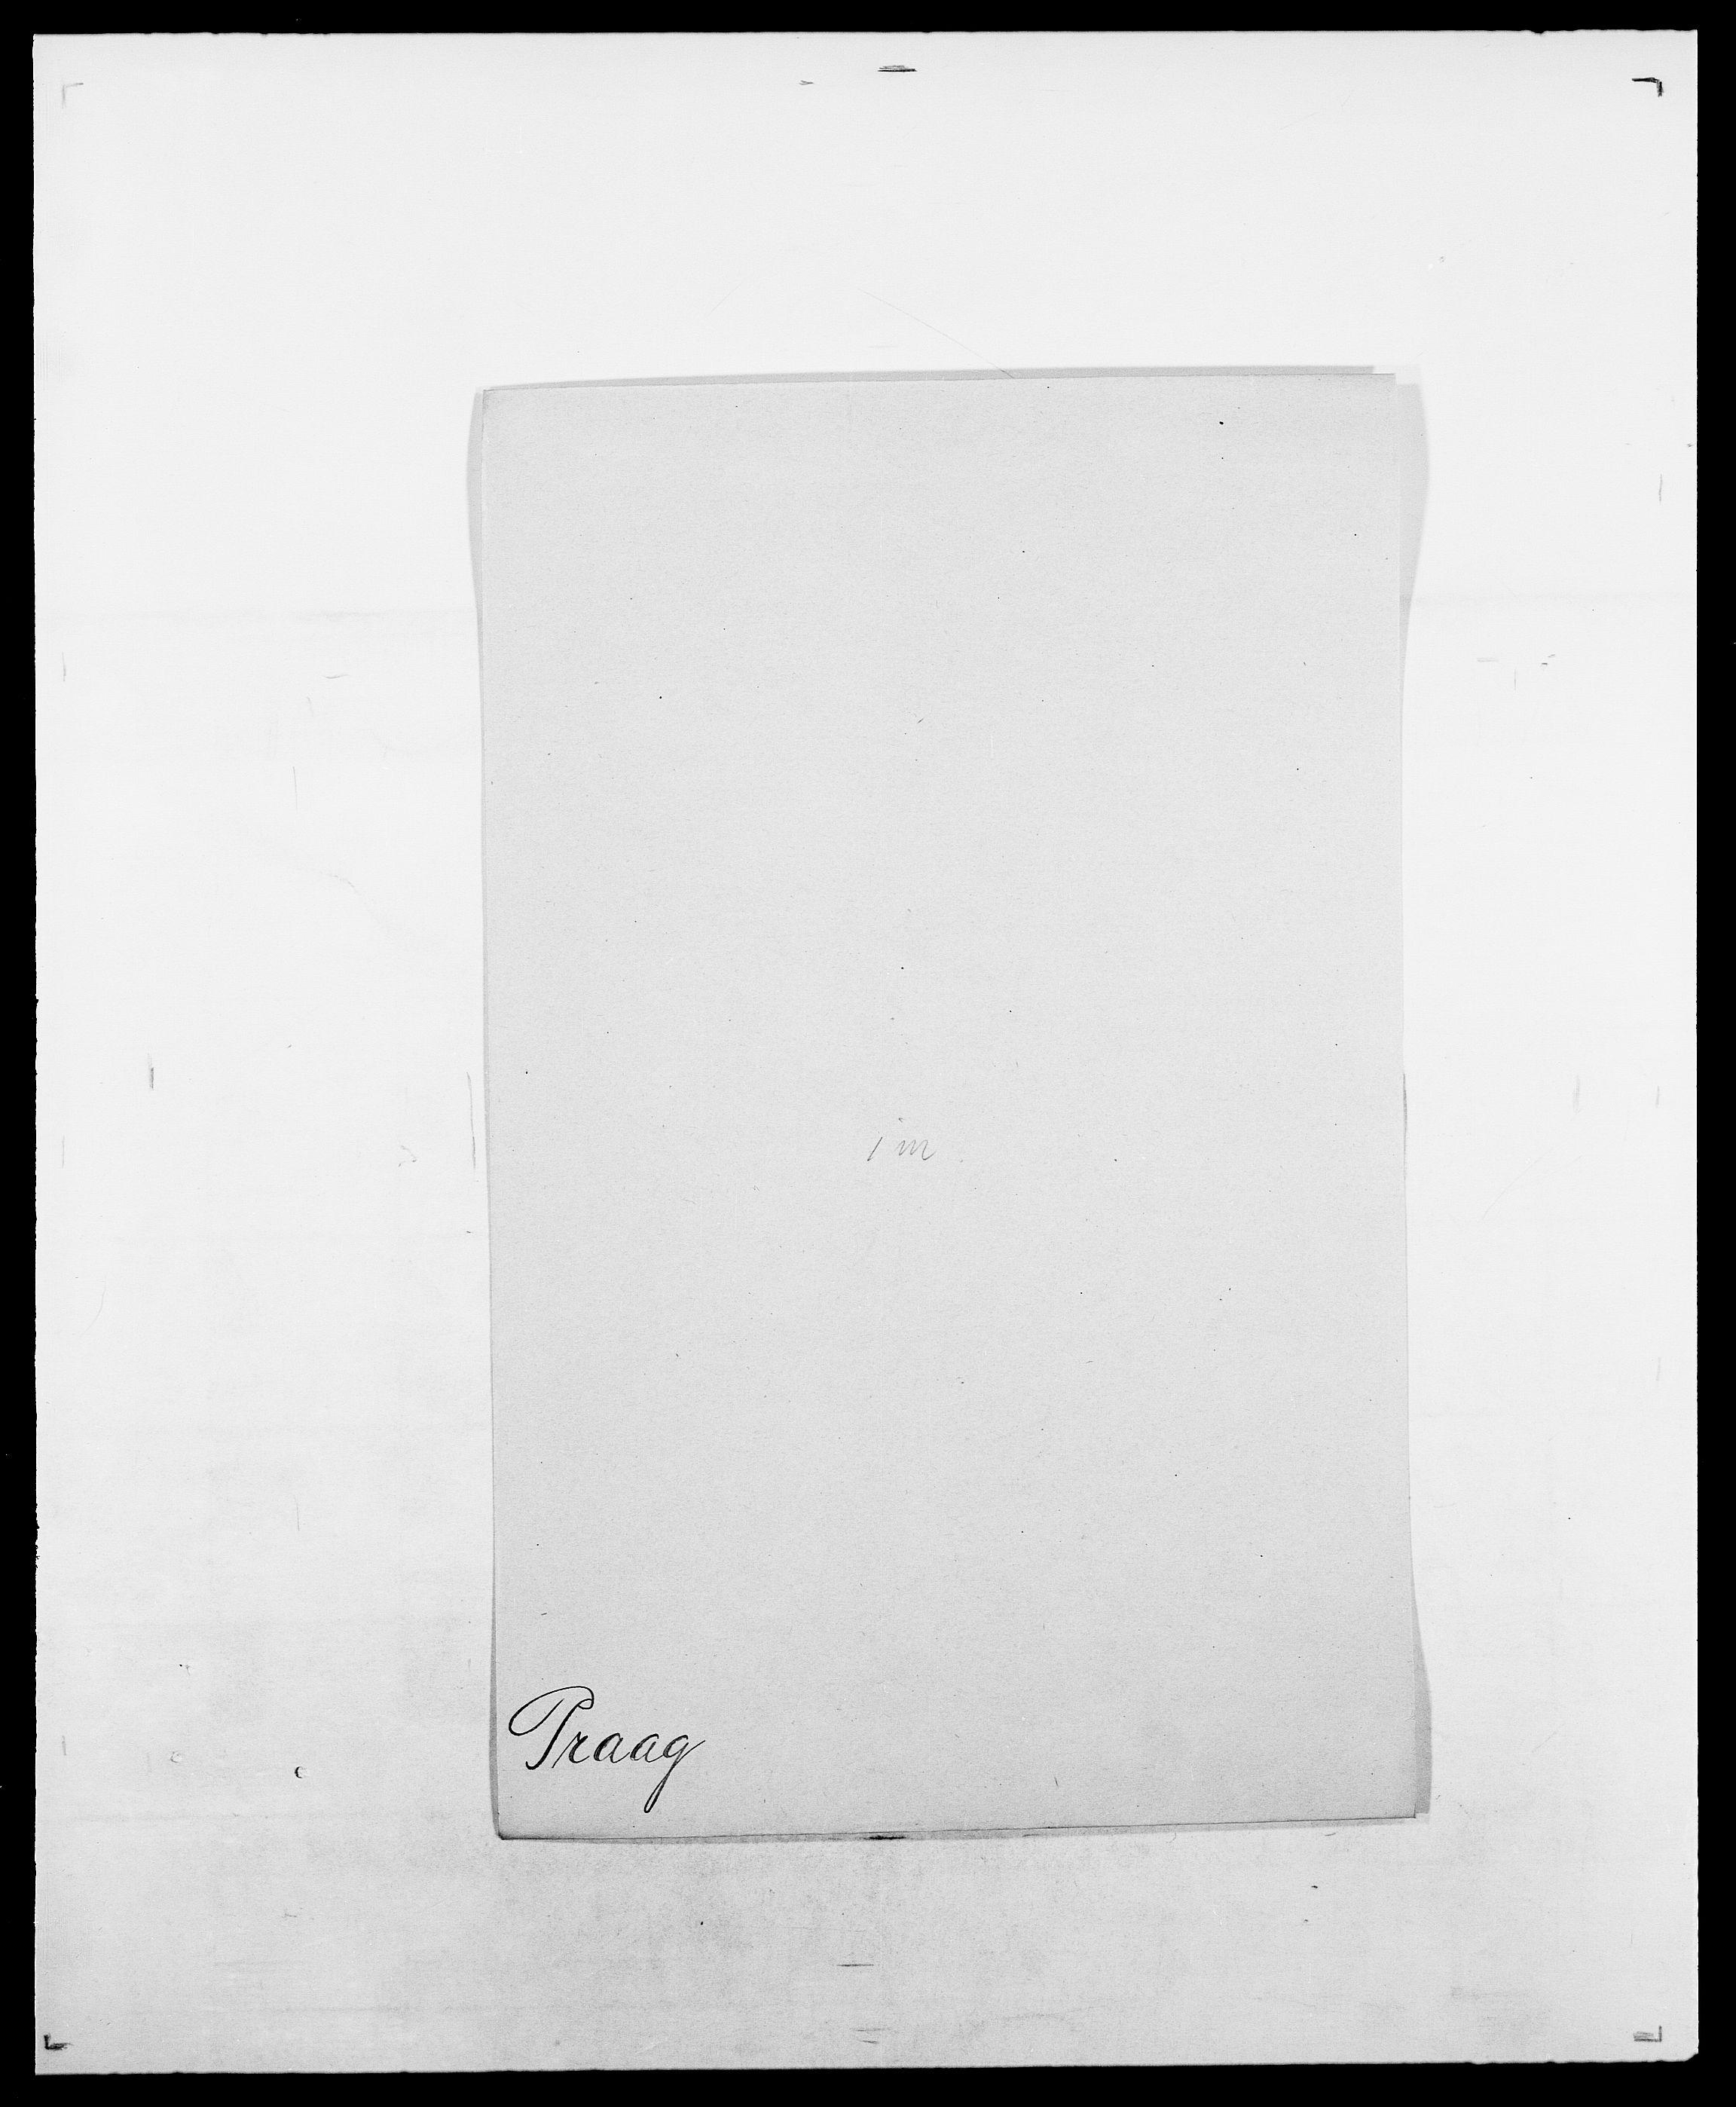 SAO, Delgobe, Charles Antoine - samling, D/Da/L0031: de Place - Raaum, s. 274